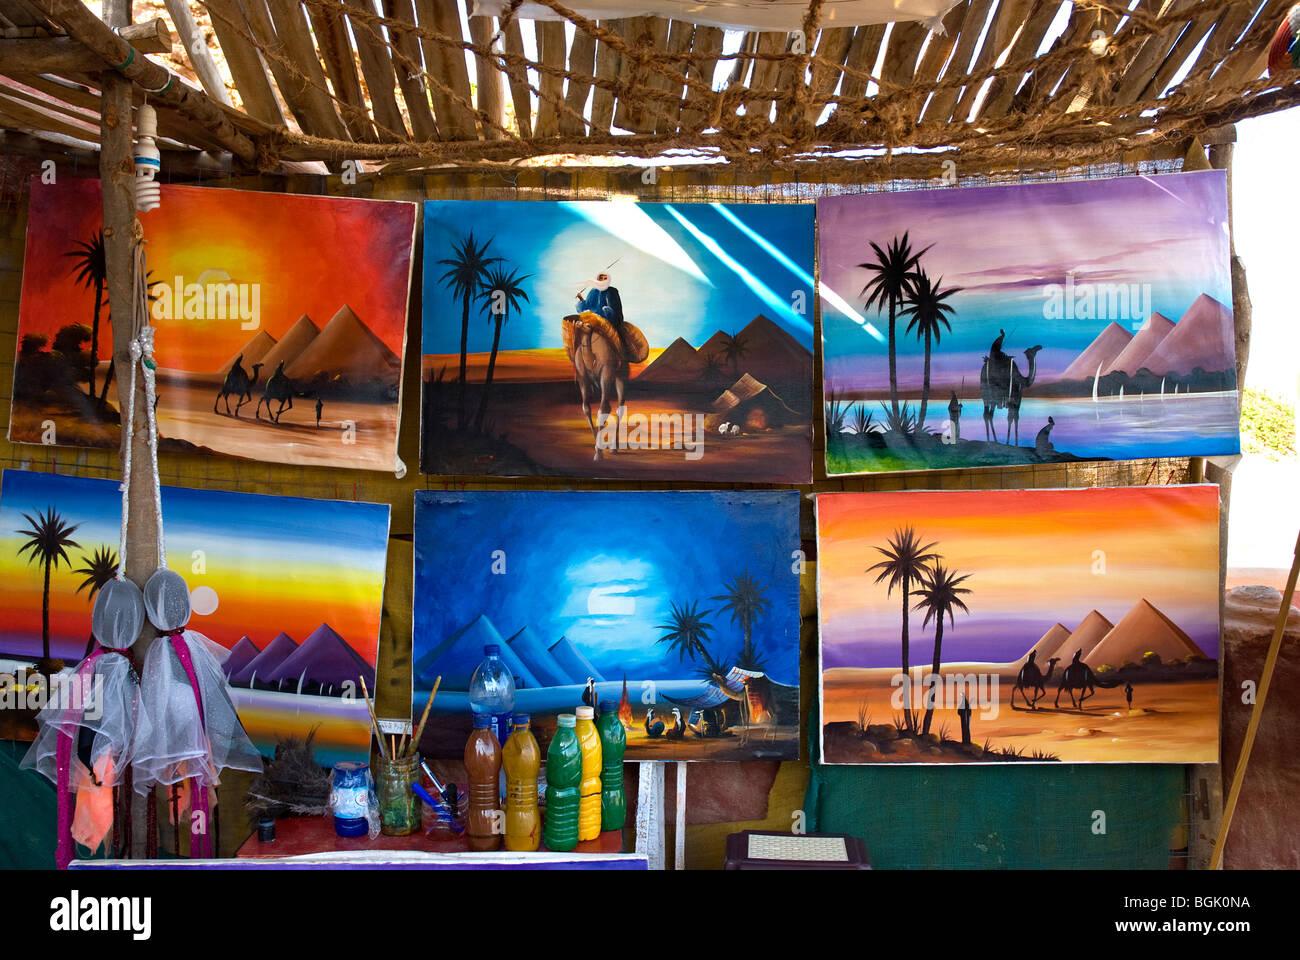 Souvenirs, Marsa Alam, Red Sea, Egypt - Stock Image